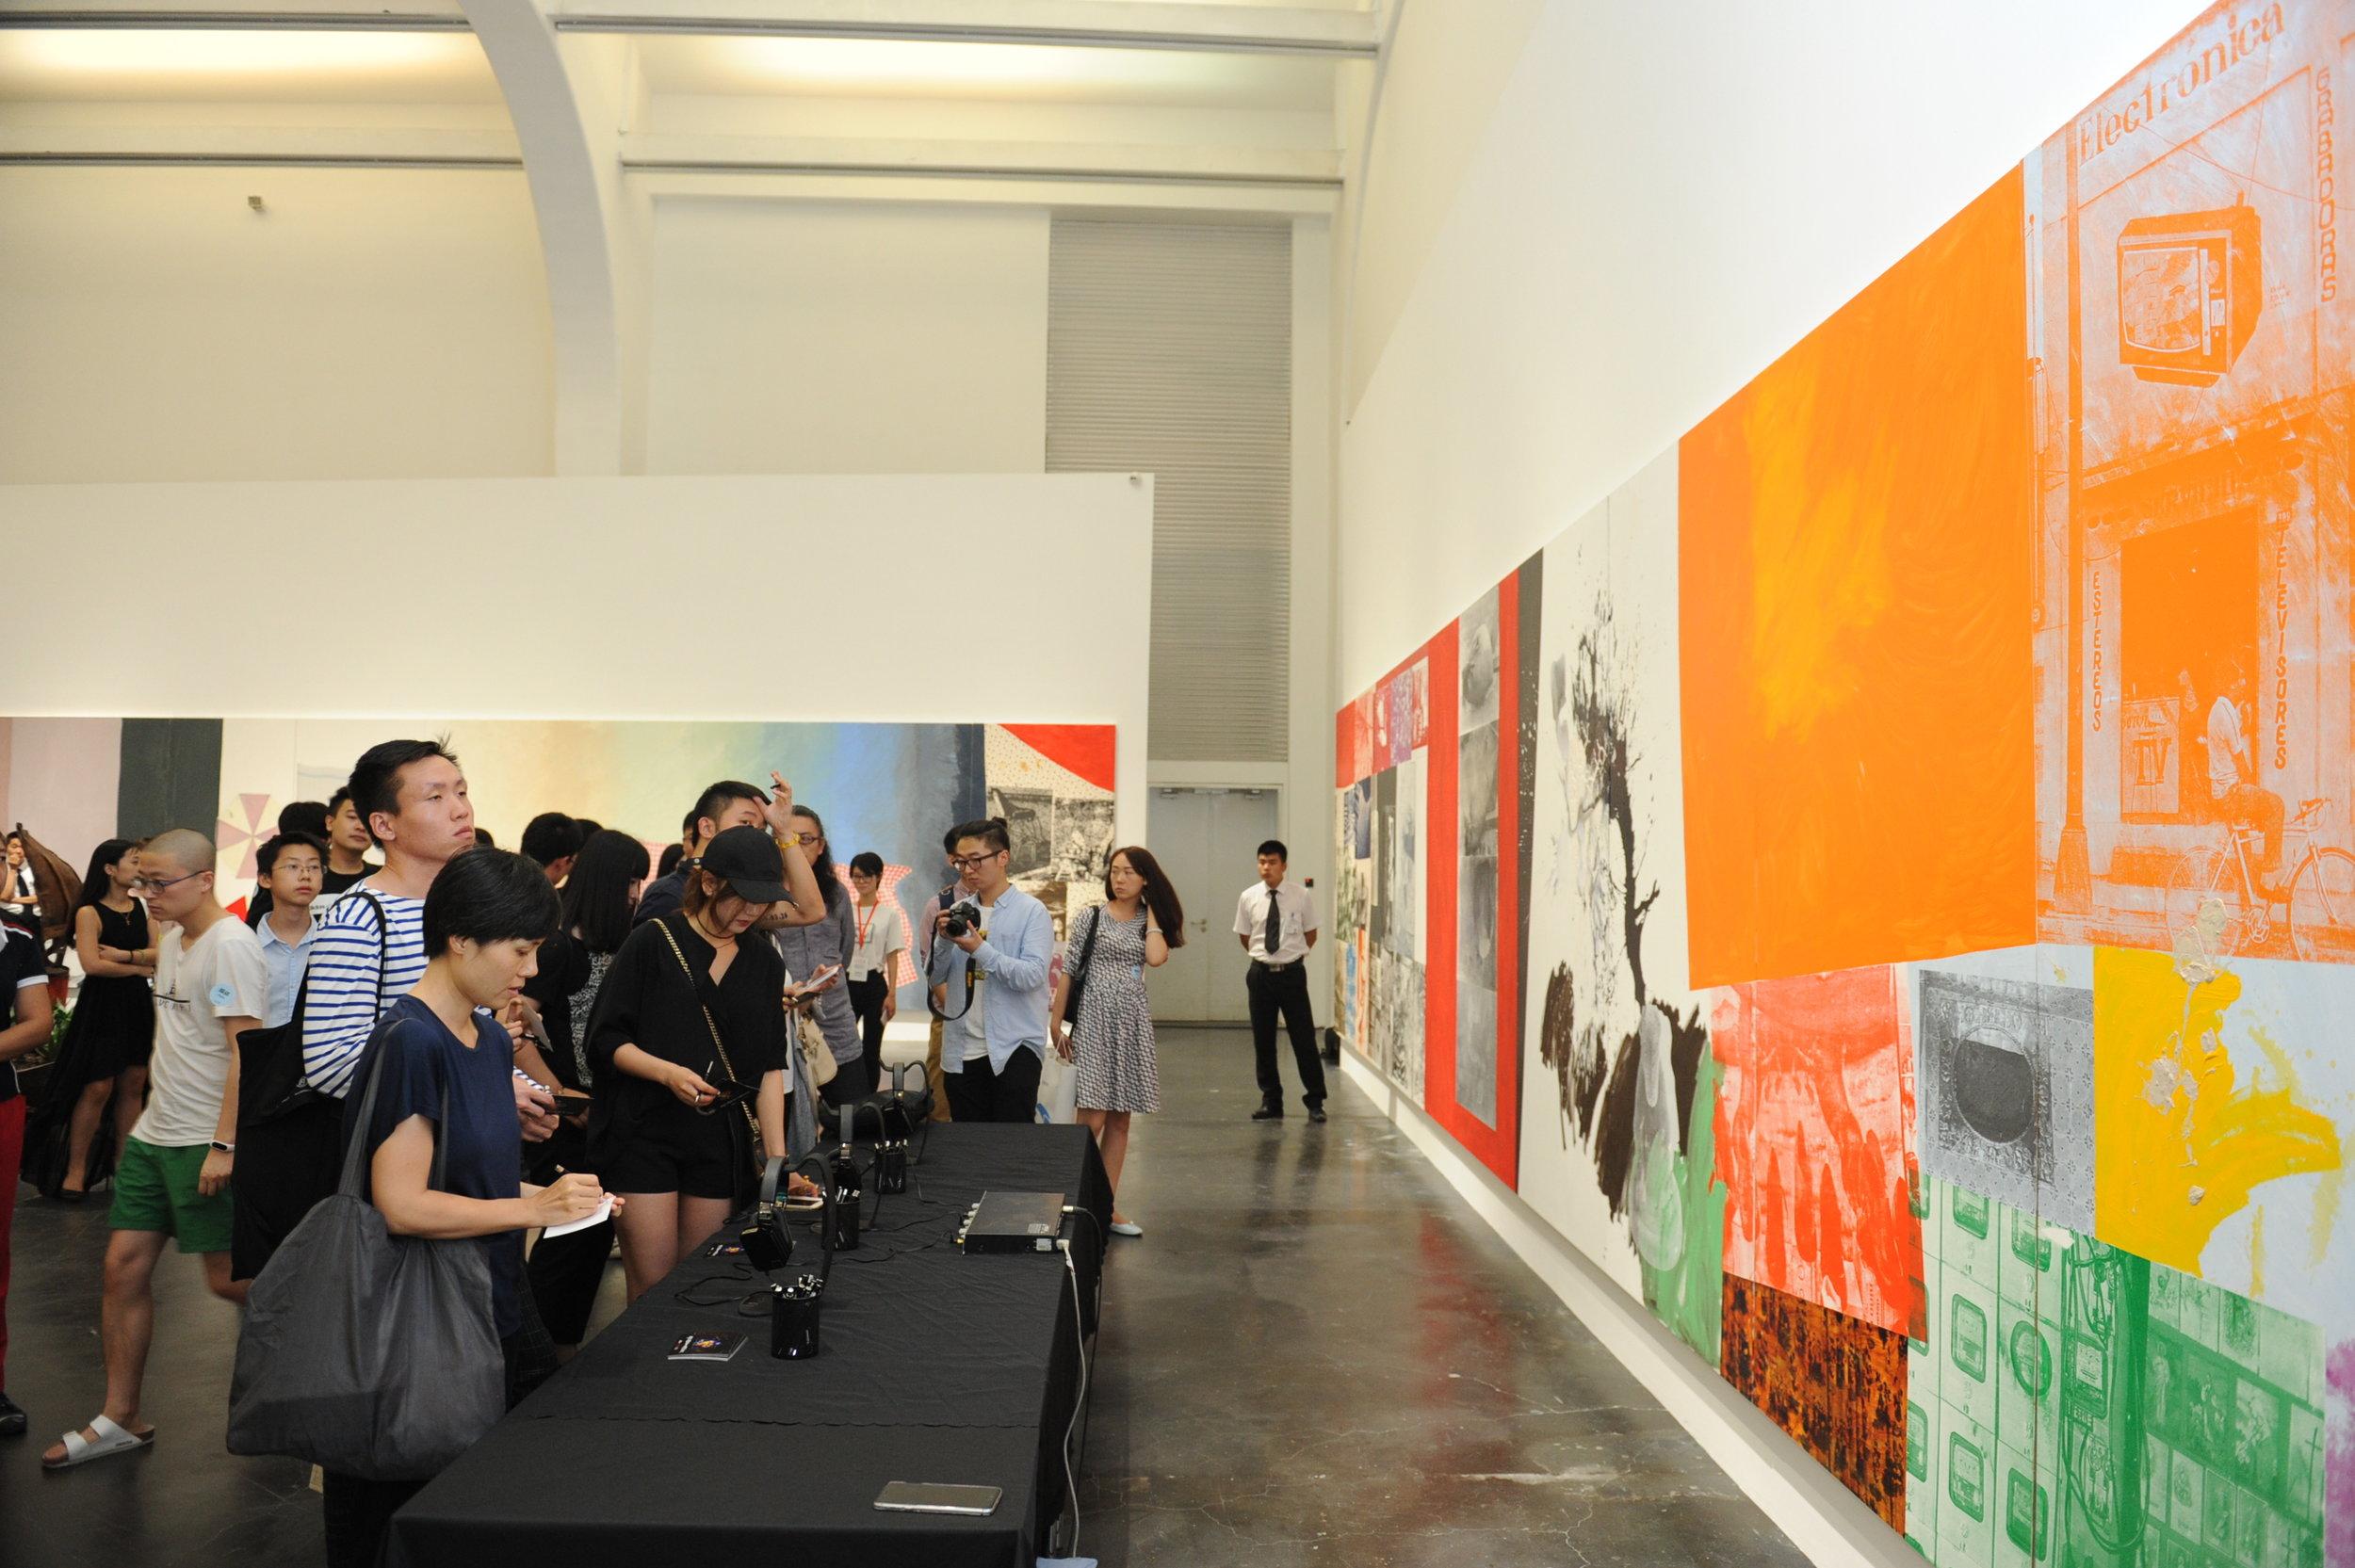 Ullens Center for Contemporary Art. (Photo Courtesy of Ullens Center for Contemporary Art)